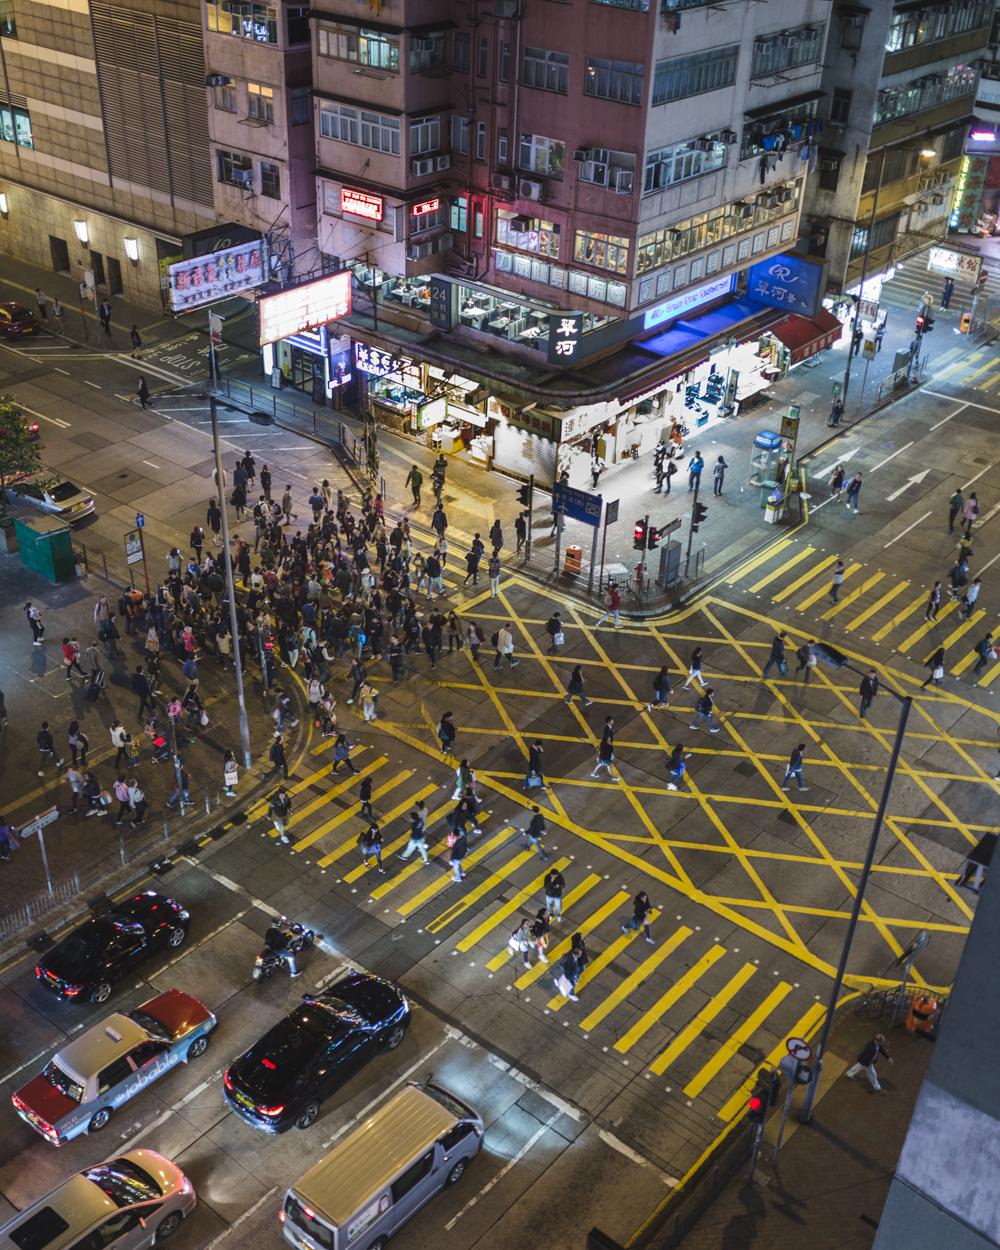 HONG KONG TRAVEL BLOG - ITCHBAN.COM - 004.jpg